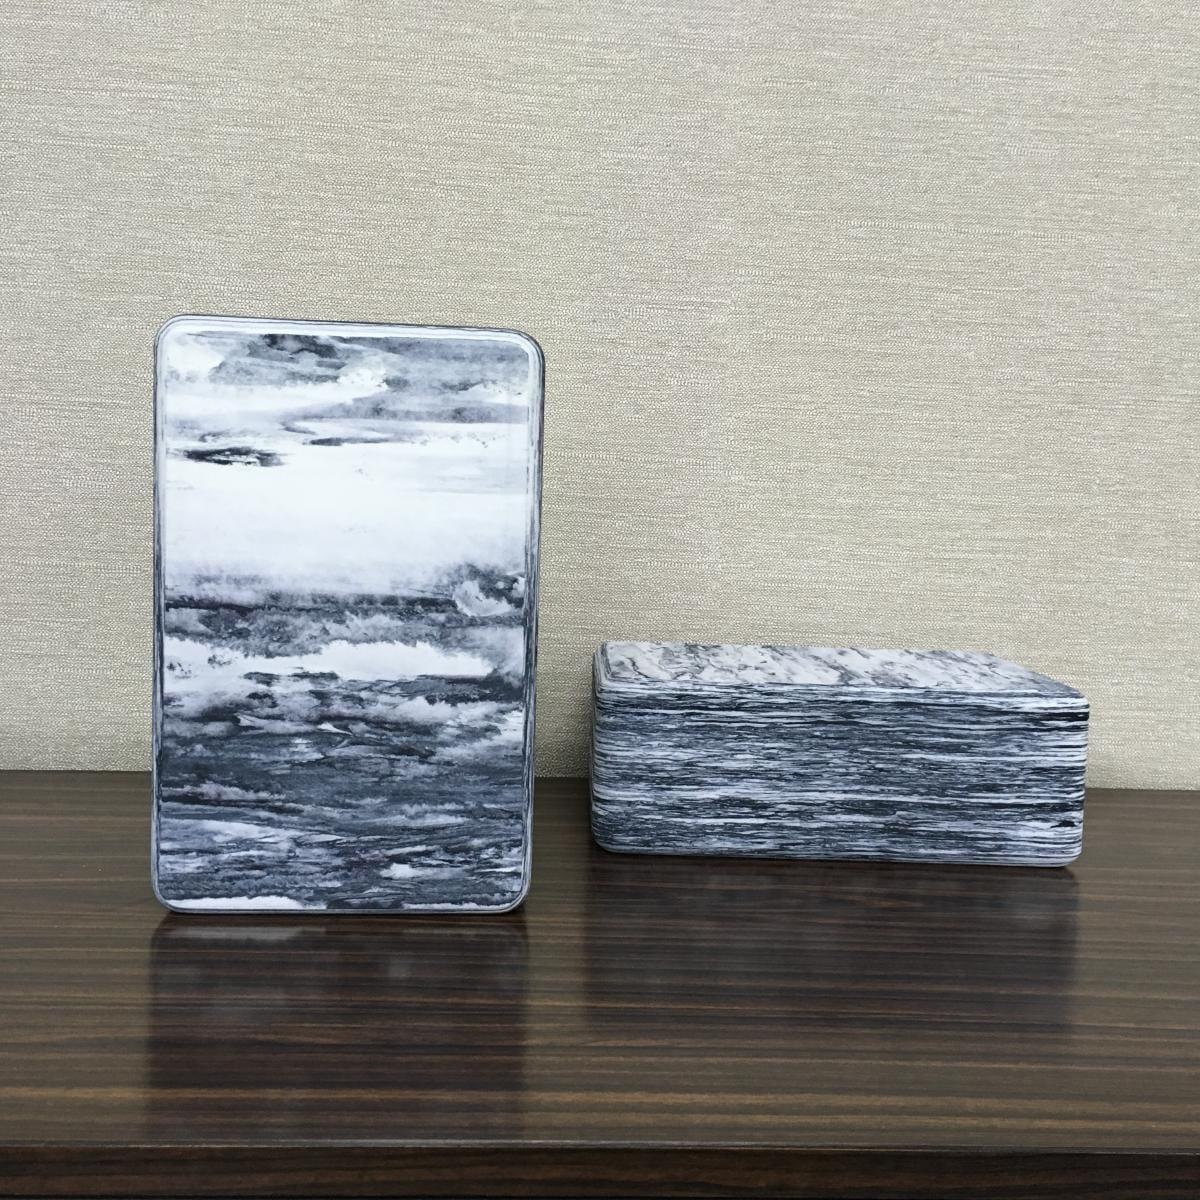 【QMAT】 40D瑜珈磚 混色系-青銅石紋、黑白雲彩 2